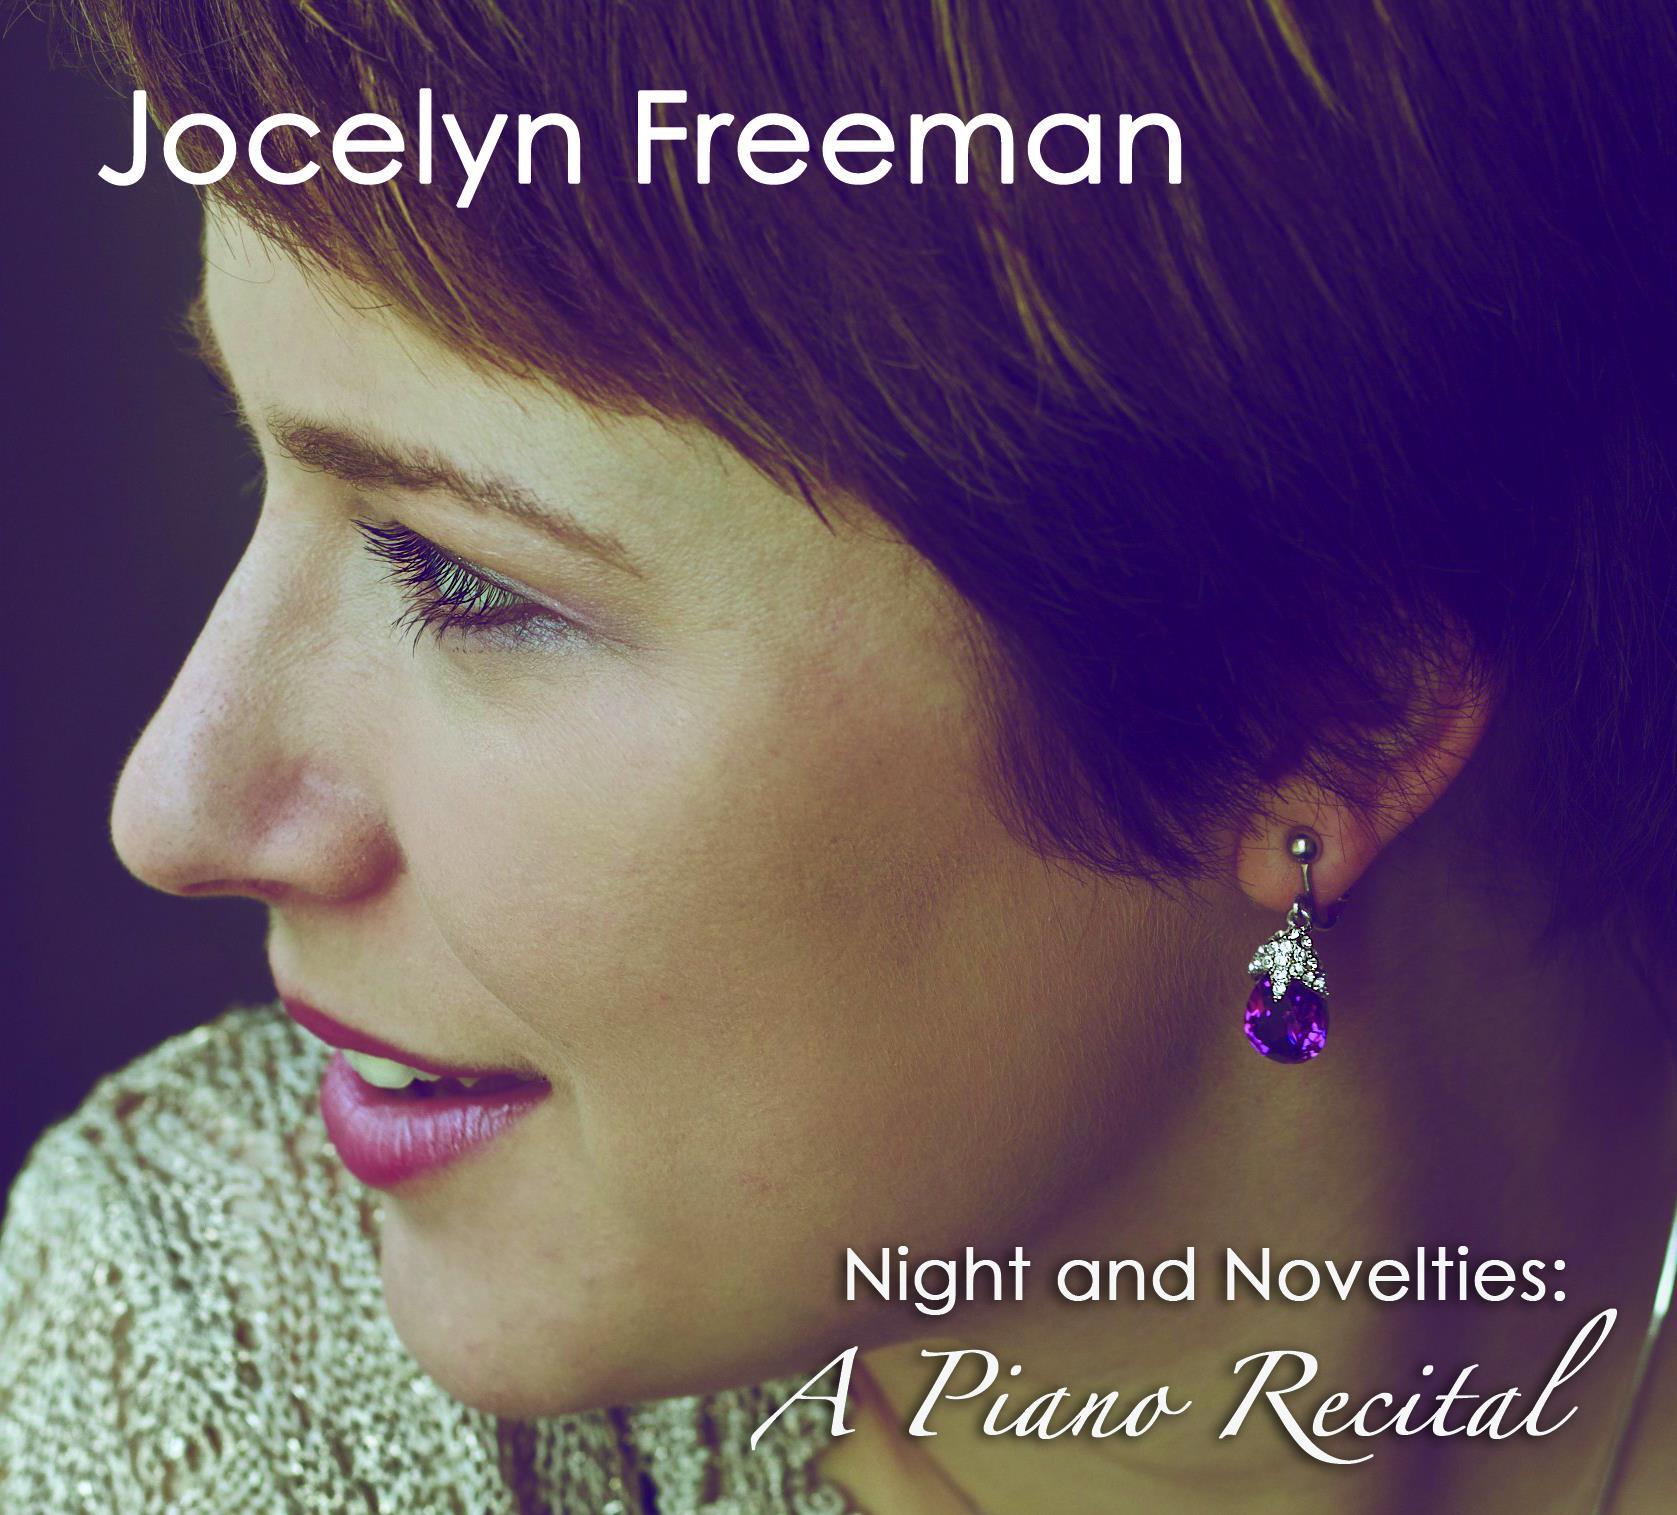 Night & Novelties: A Piano Recital